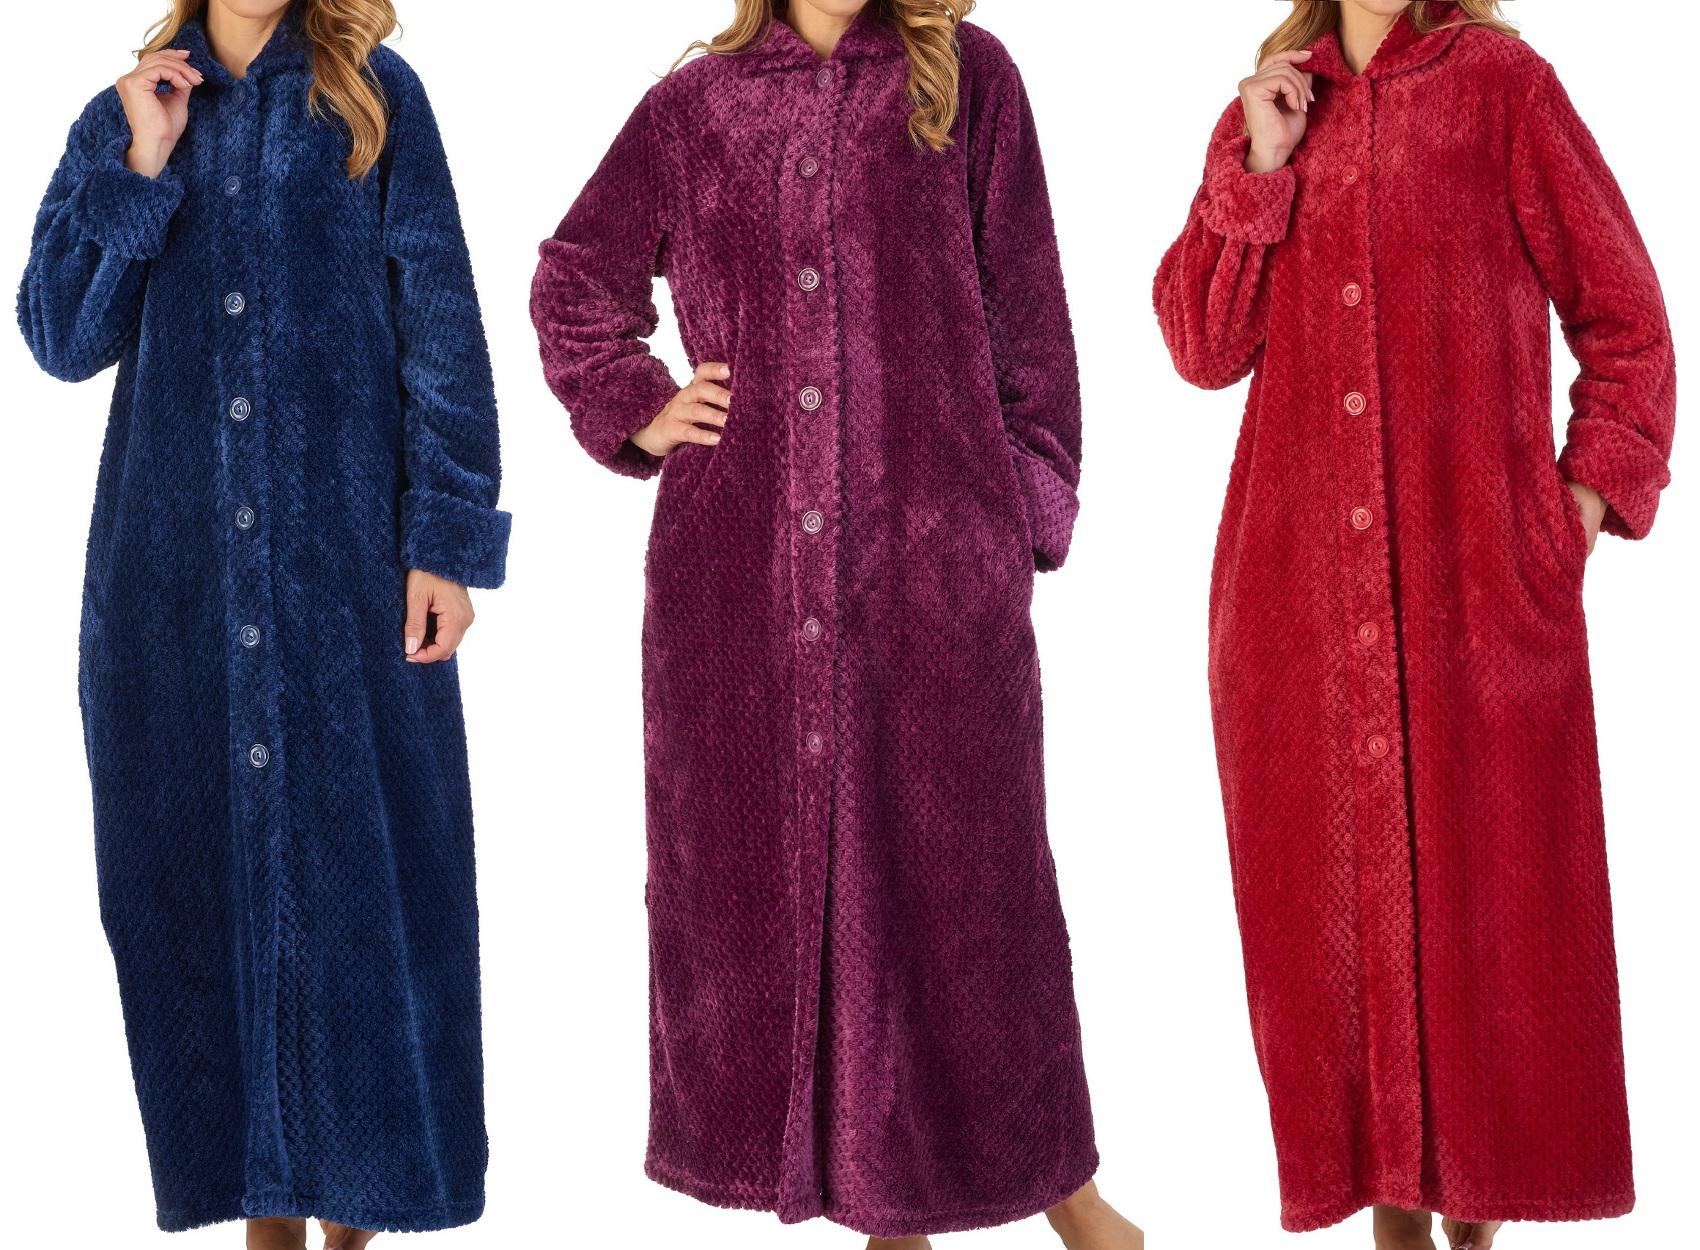 5fad4009c8 Dressing Gown Ladies Button Up Waffle Flannel Fleece Slenderella Nightwear  Robe